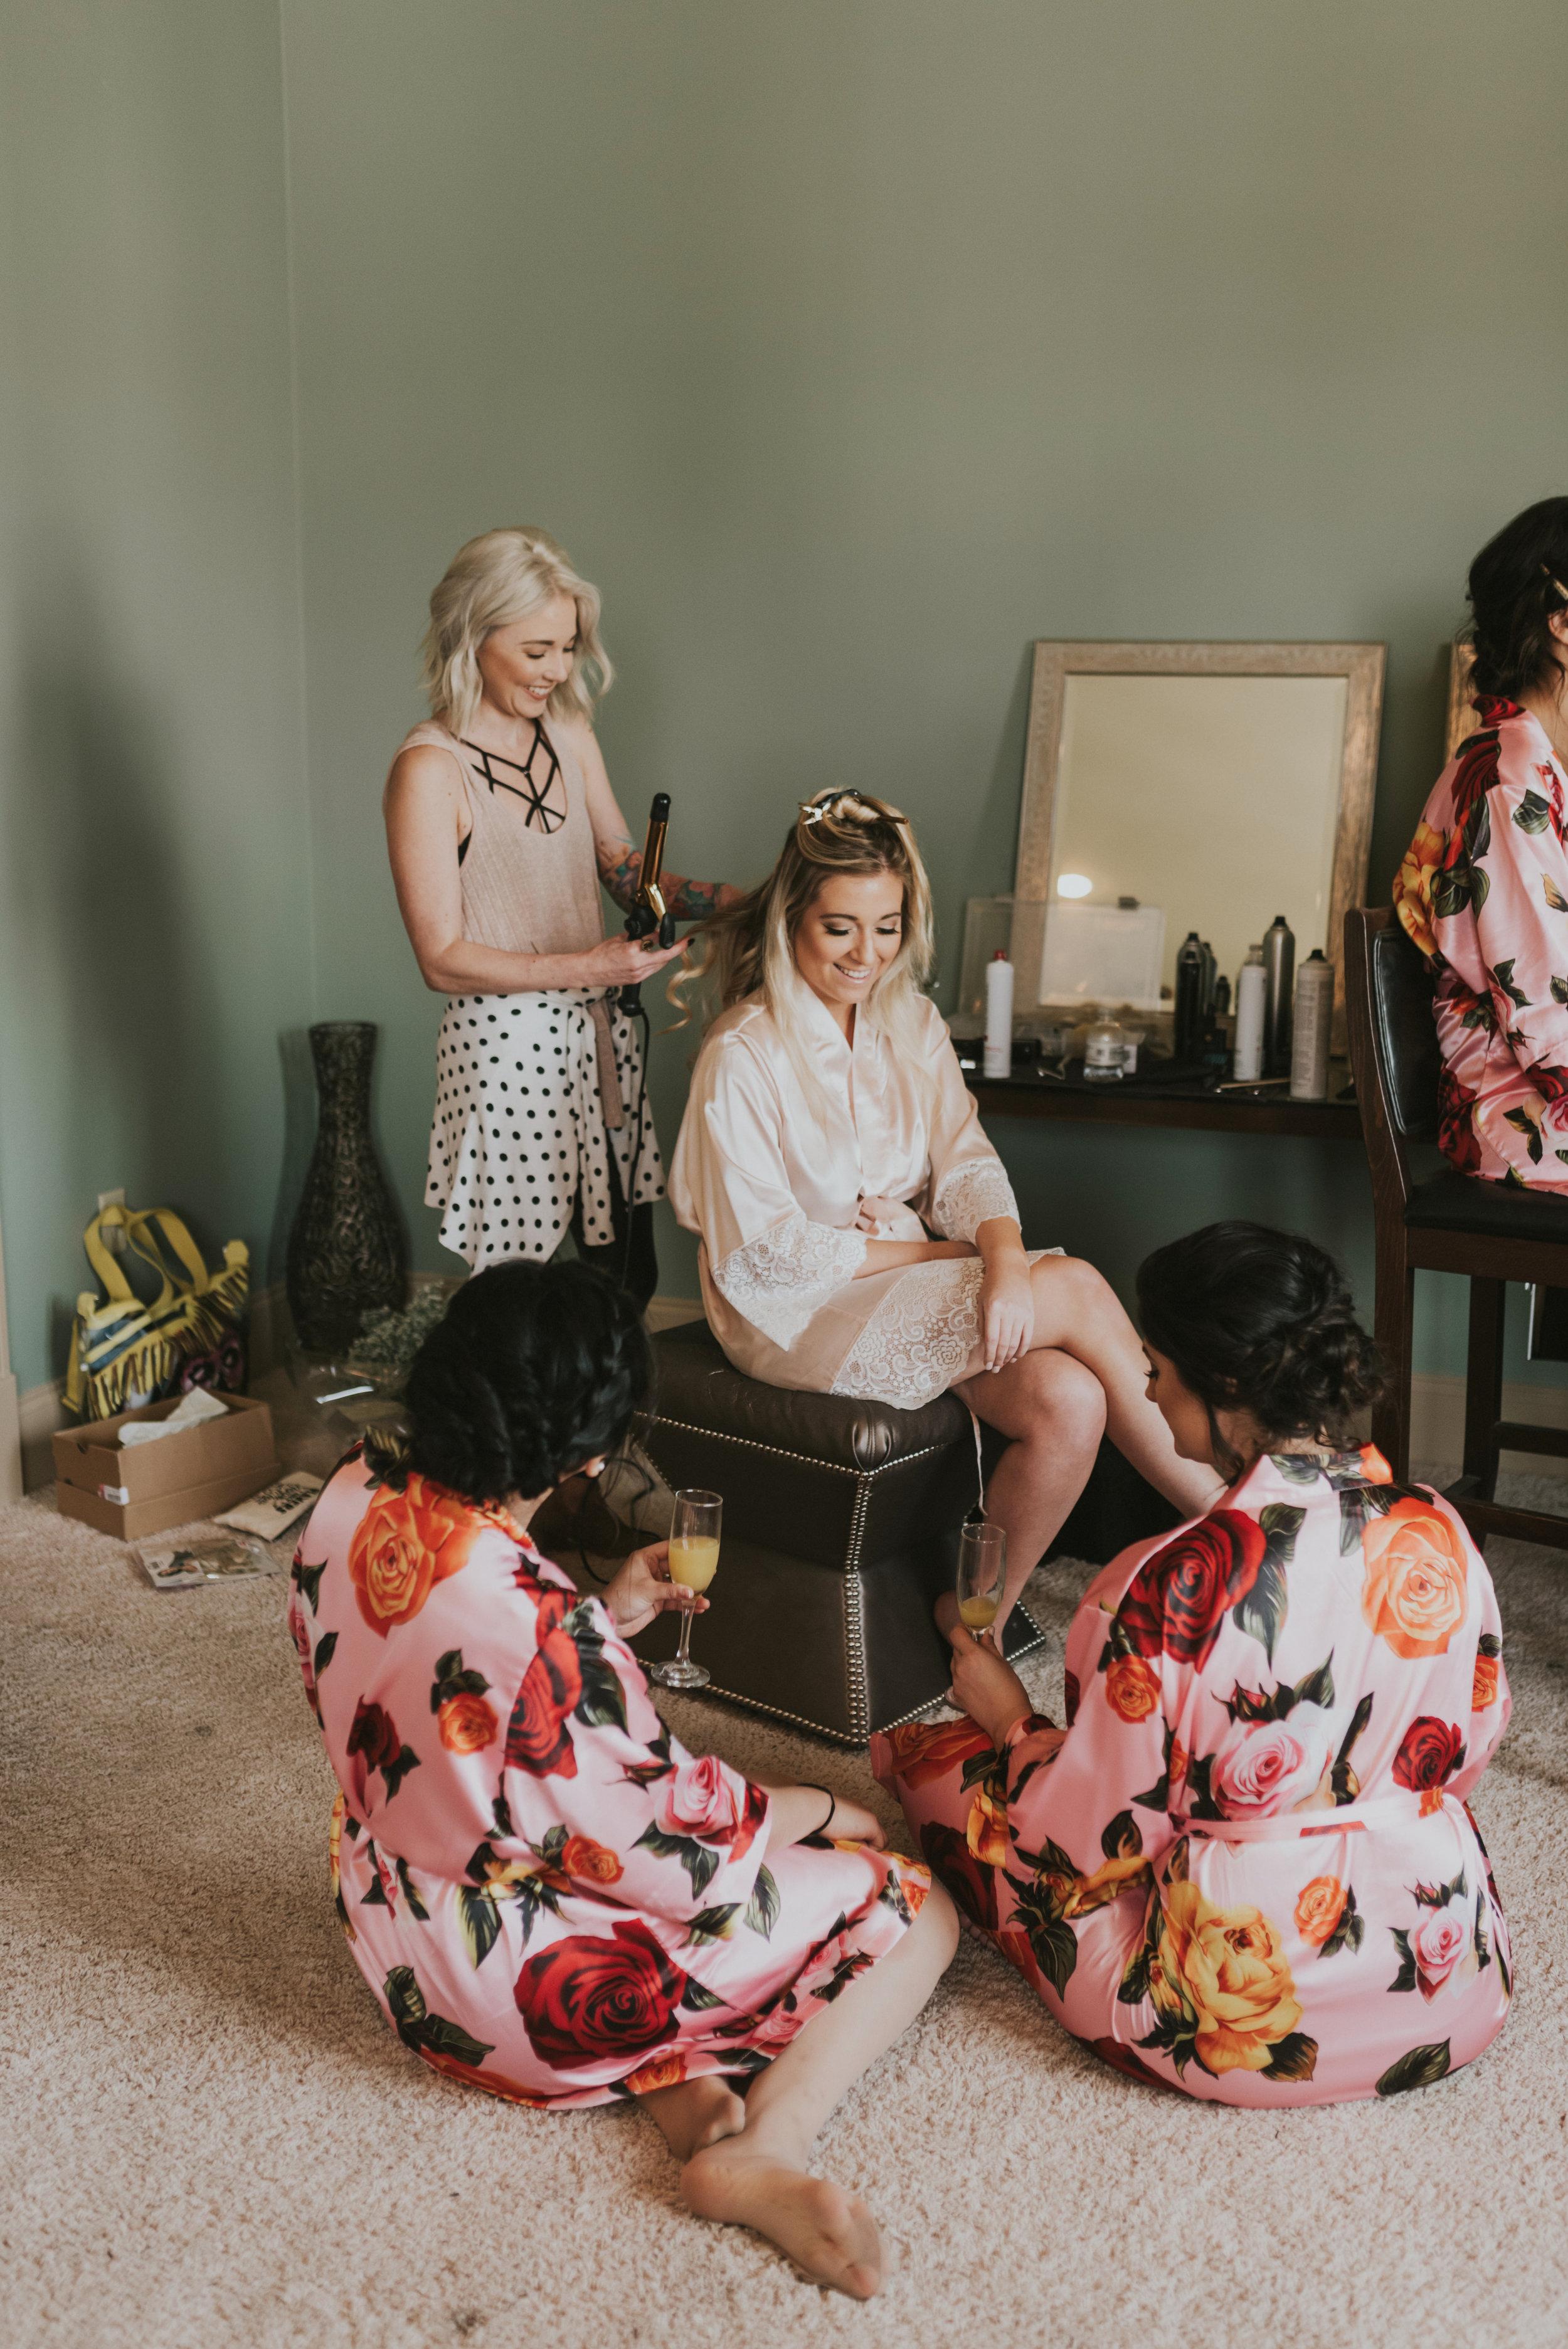 Southern Fete, Southern Wedding, Bride and Bridesmaid, Mimosa's, The Cut House Salon, Jen Menard Photo